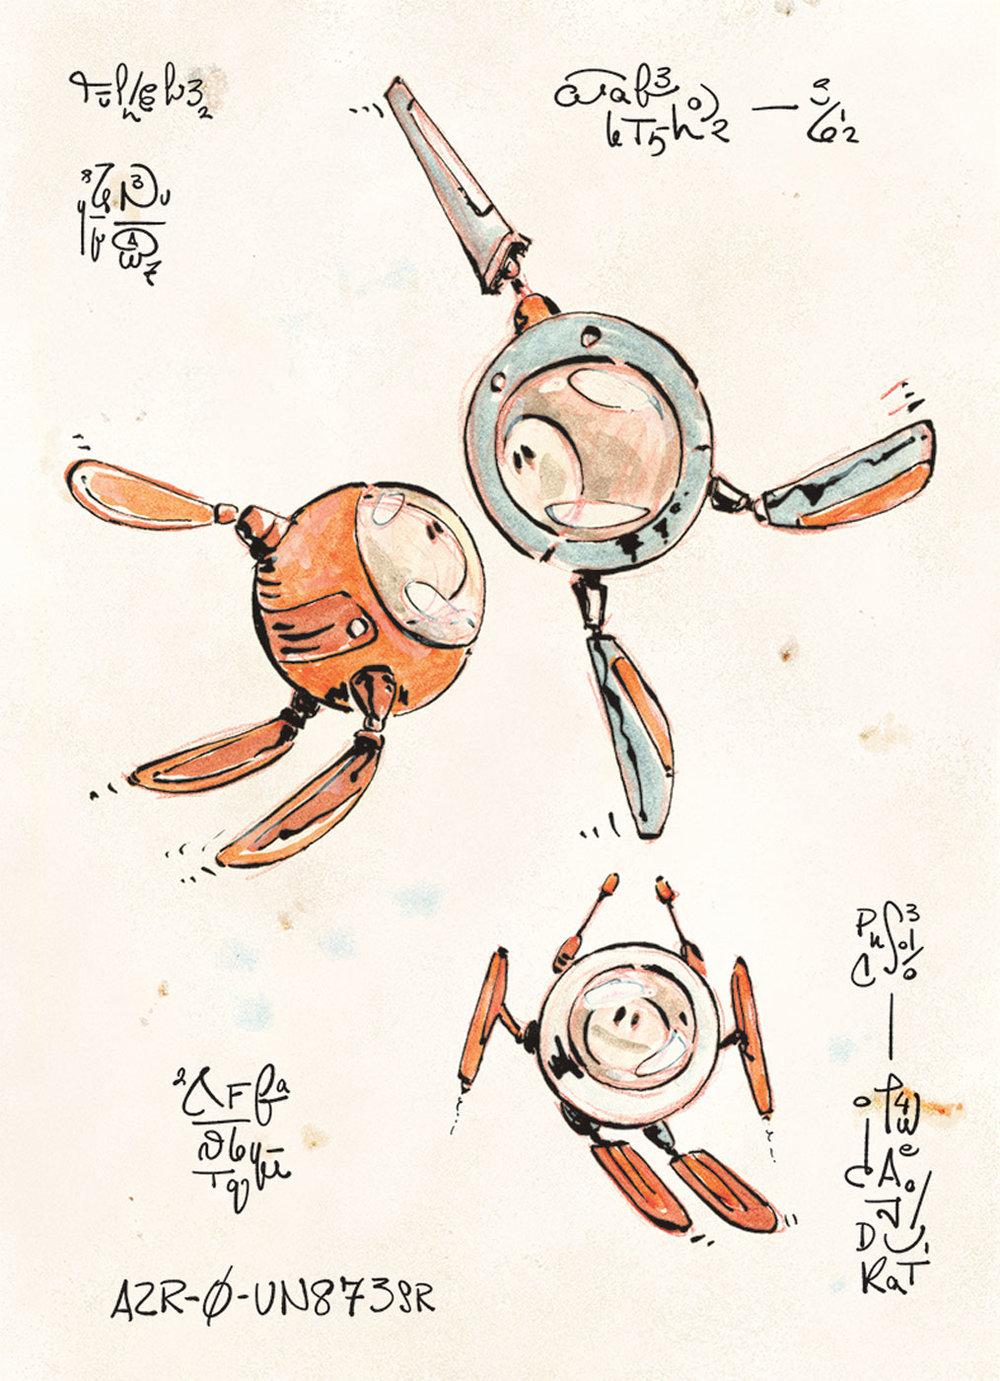 AZR-0 Robots - Book Illustration - sample page 3